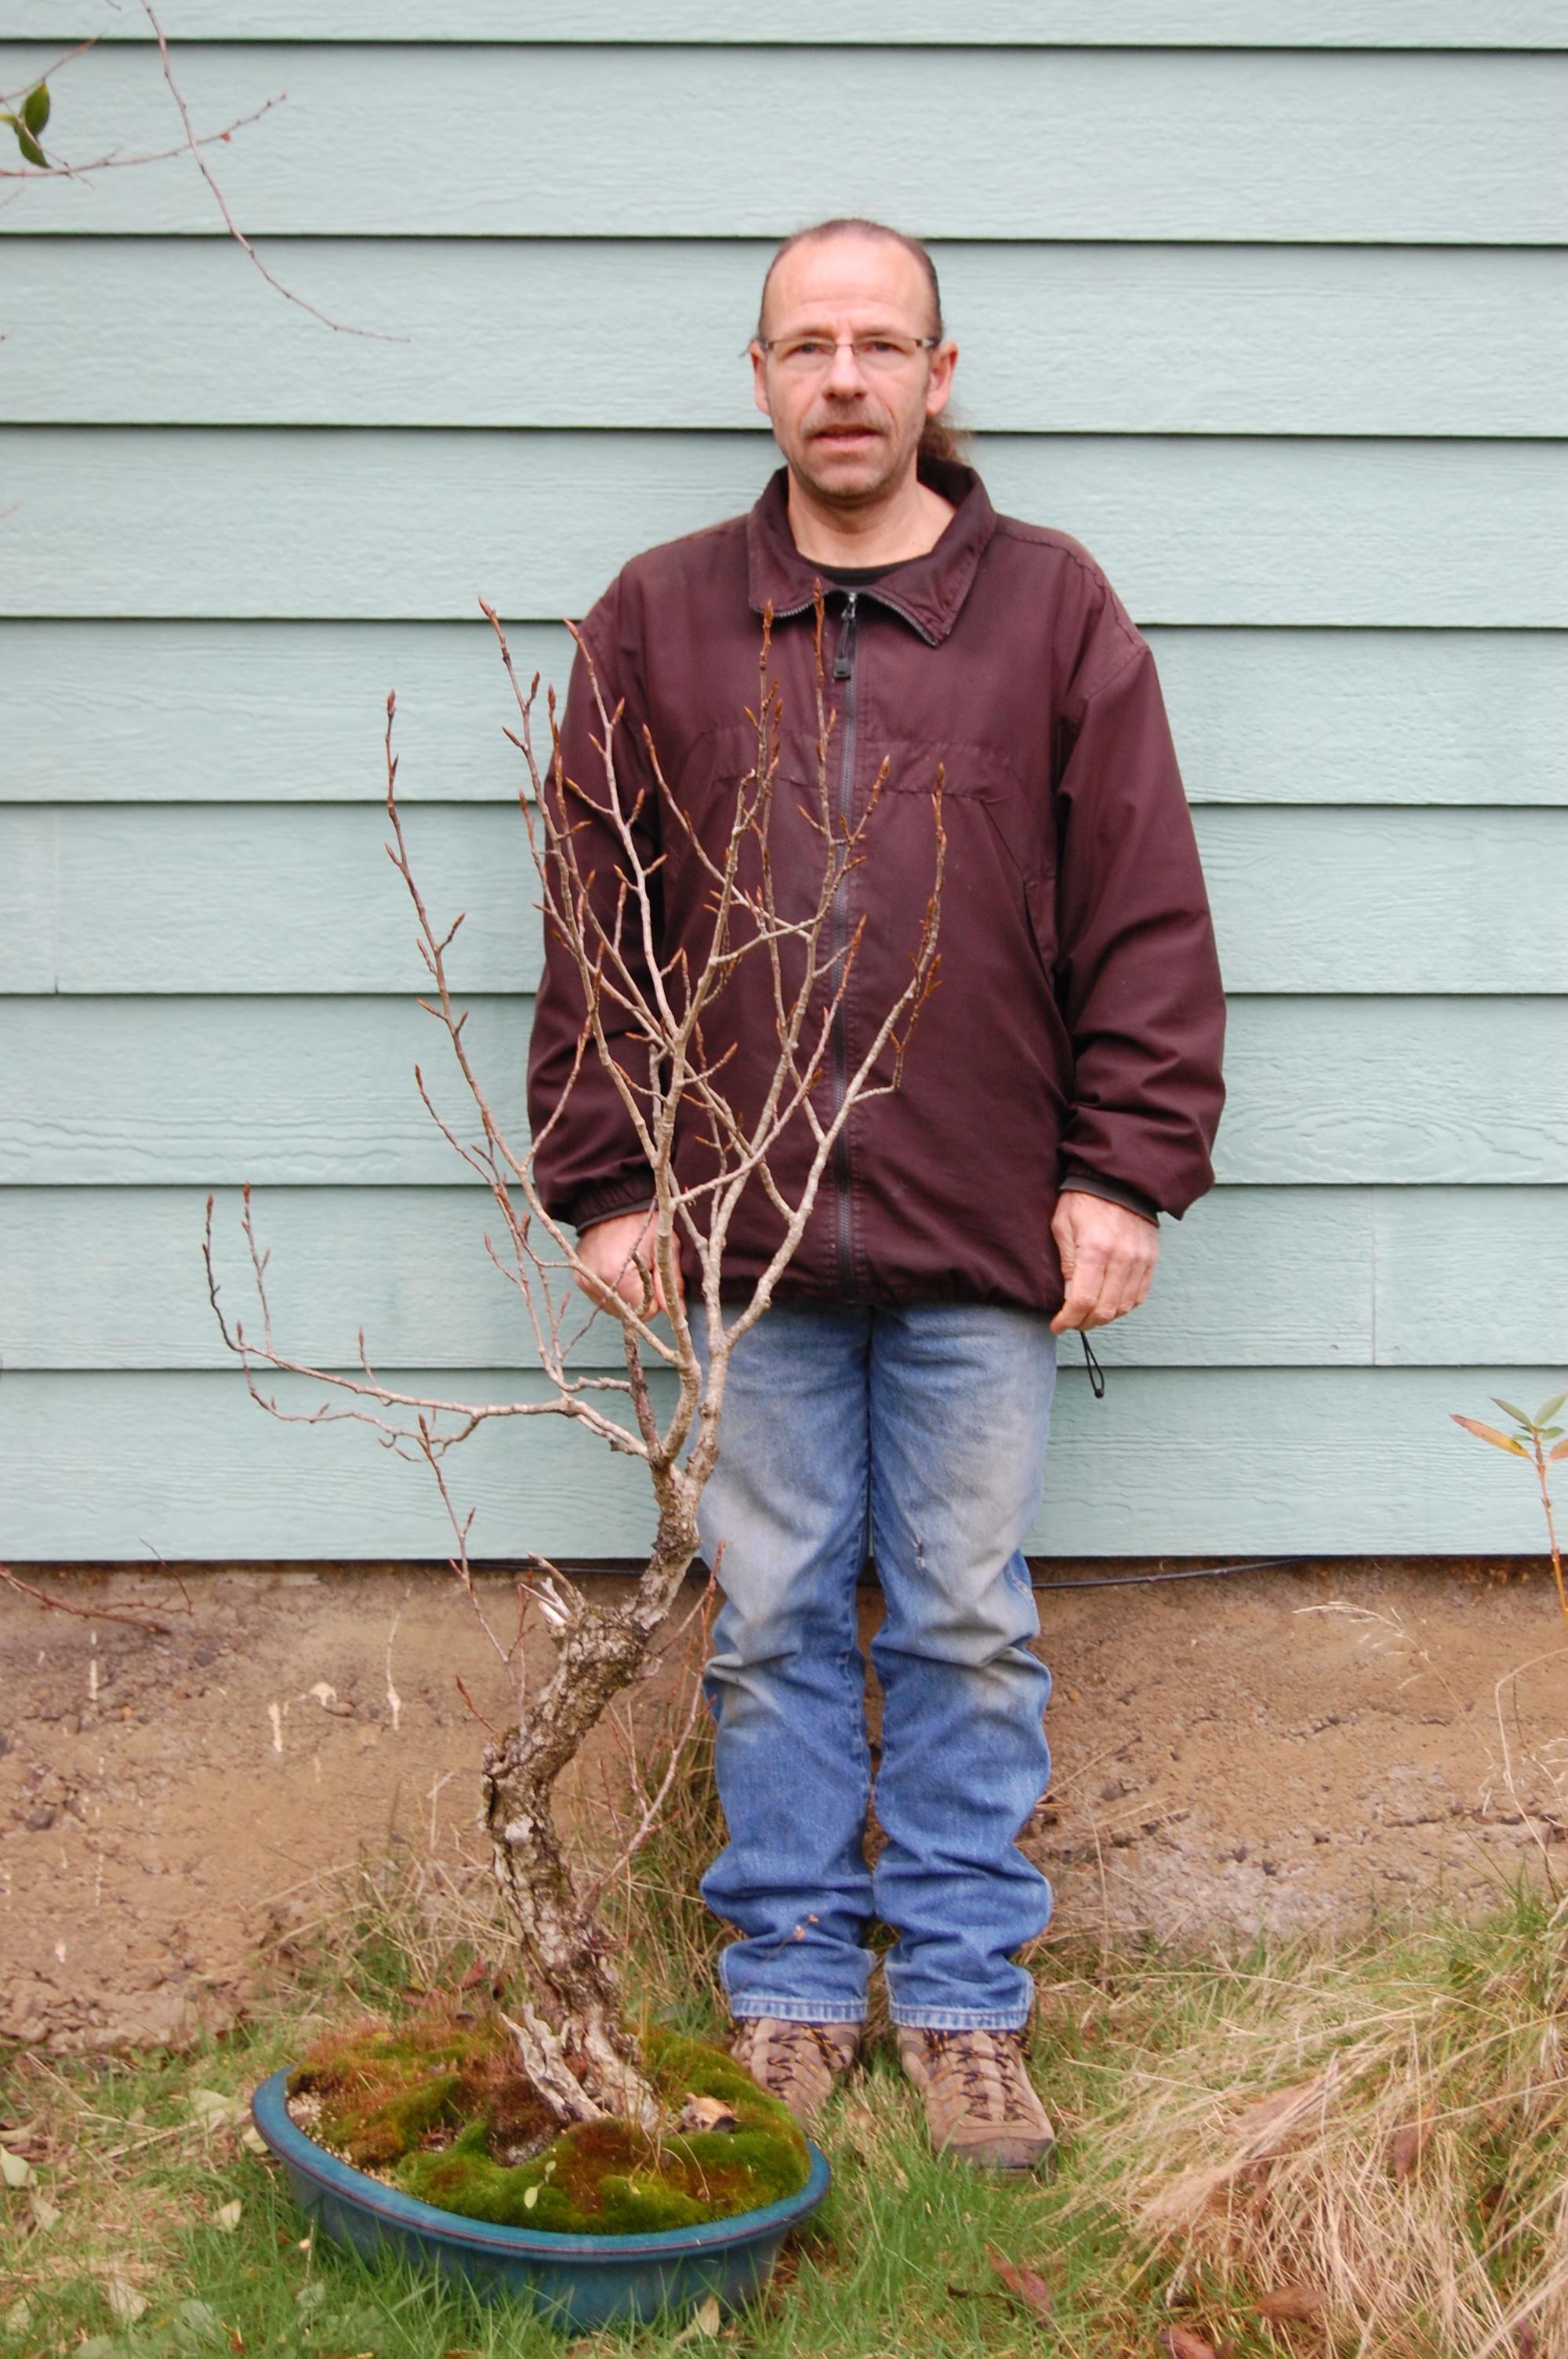 Cottonwood Bonsai : cottonwood, bonsai, Collected, Cottonwood, Bonsai, Brendenstudio